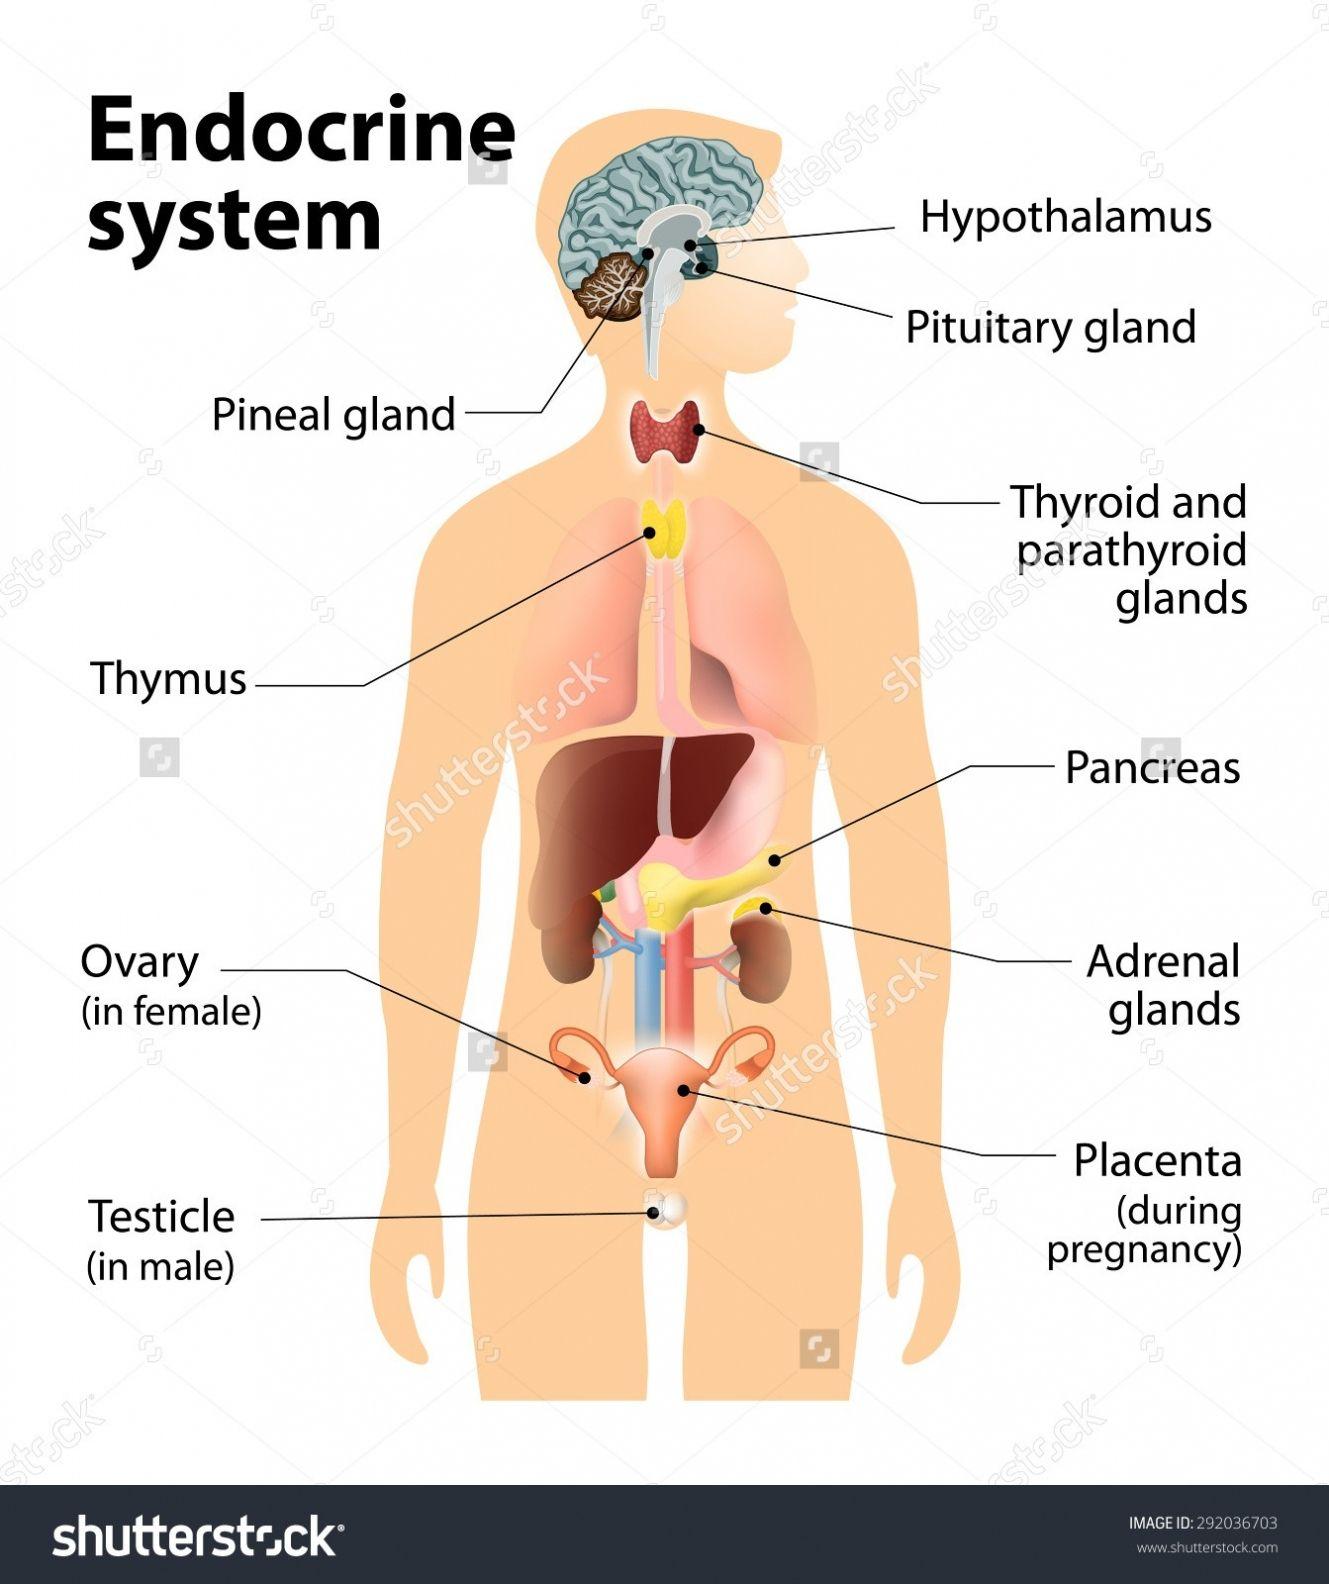 d55be8b4fd73230b97565674187e344d organ diagram female body human anatomy drawing pinterest